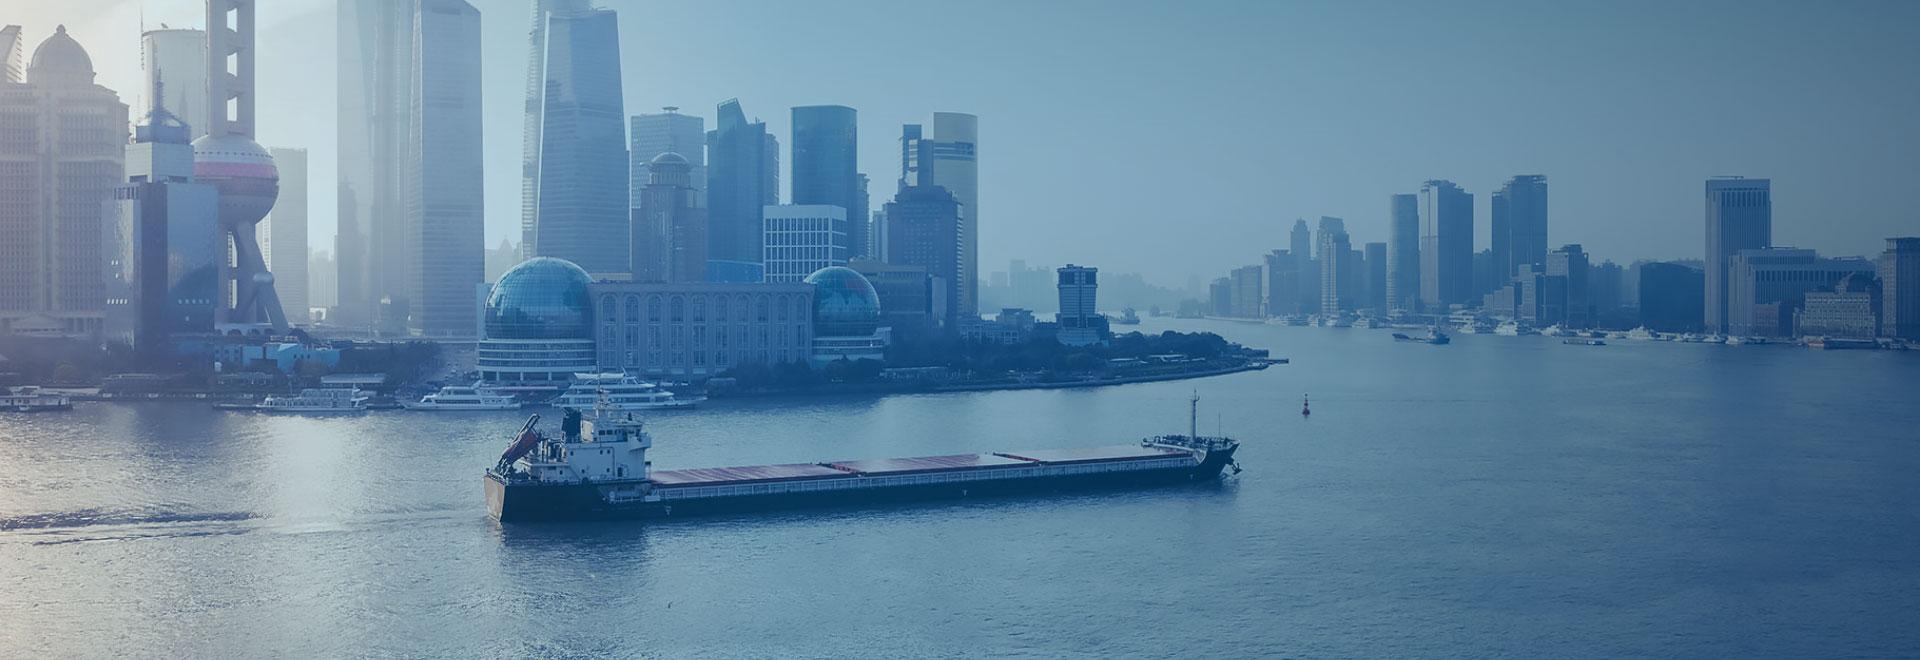 China-made ship for sale / China Domestic Ship